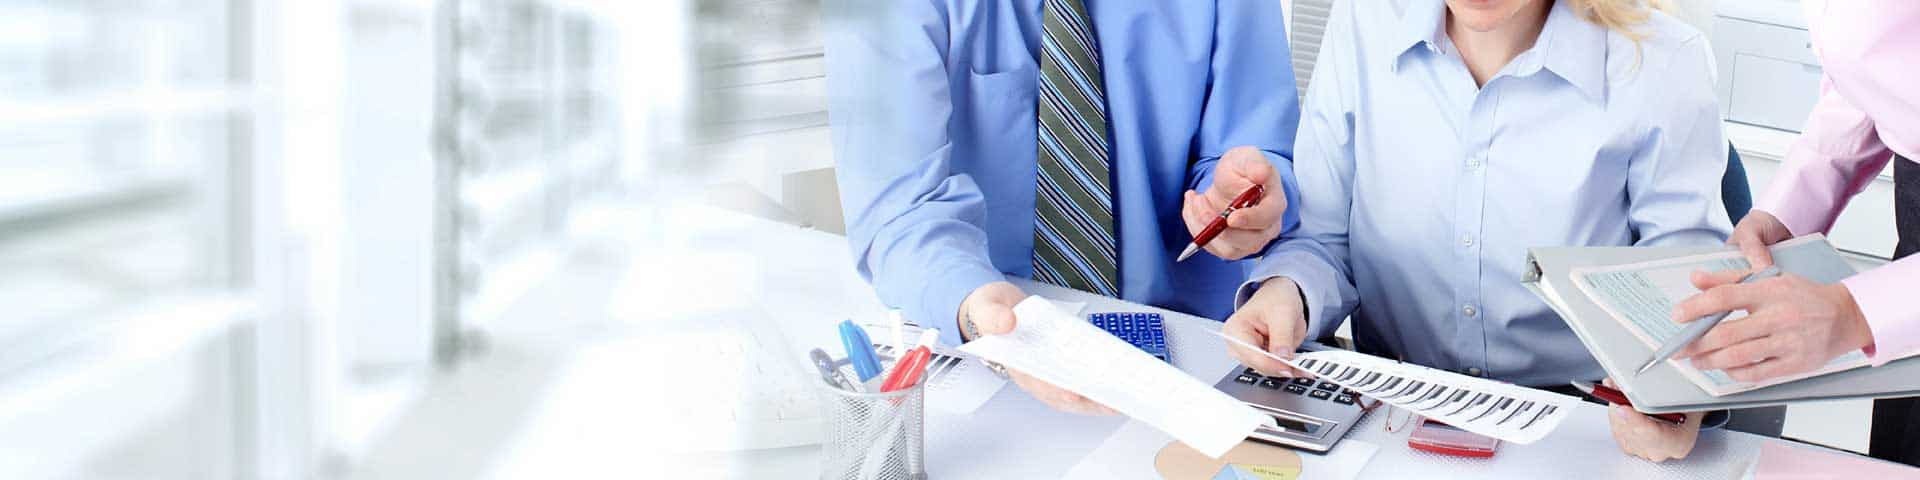 Büroservice online auslagern